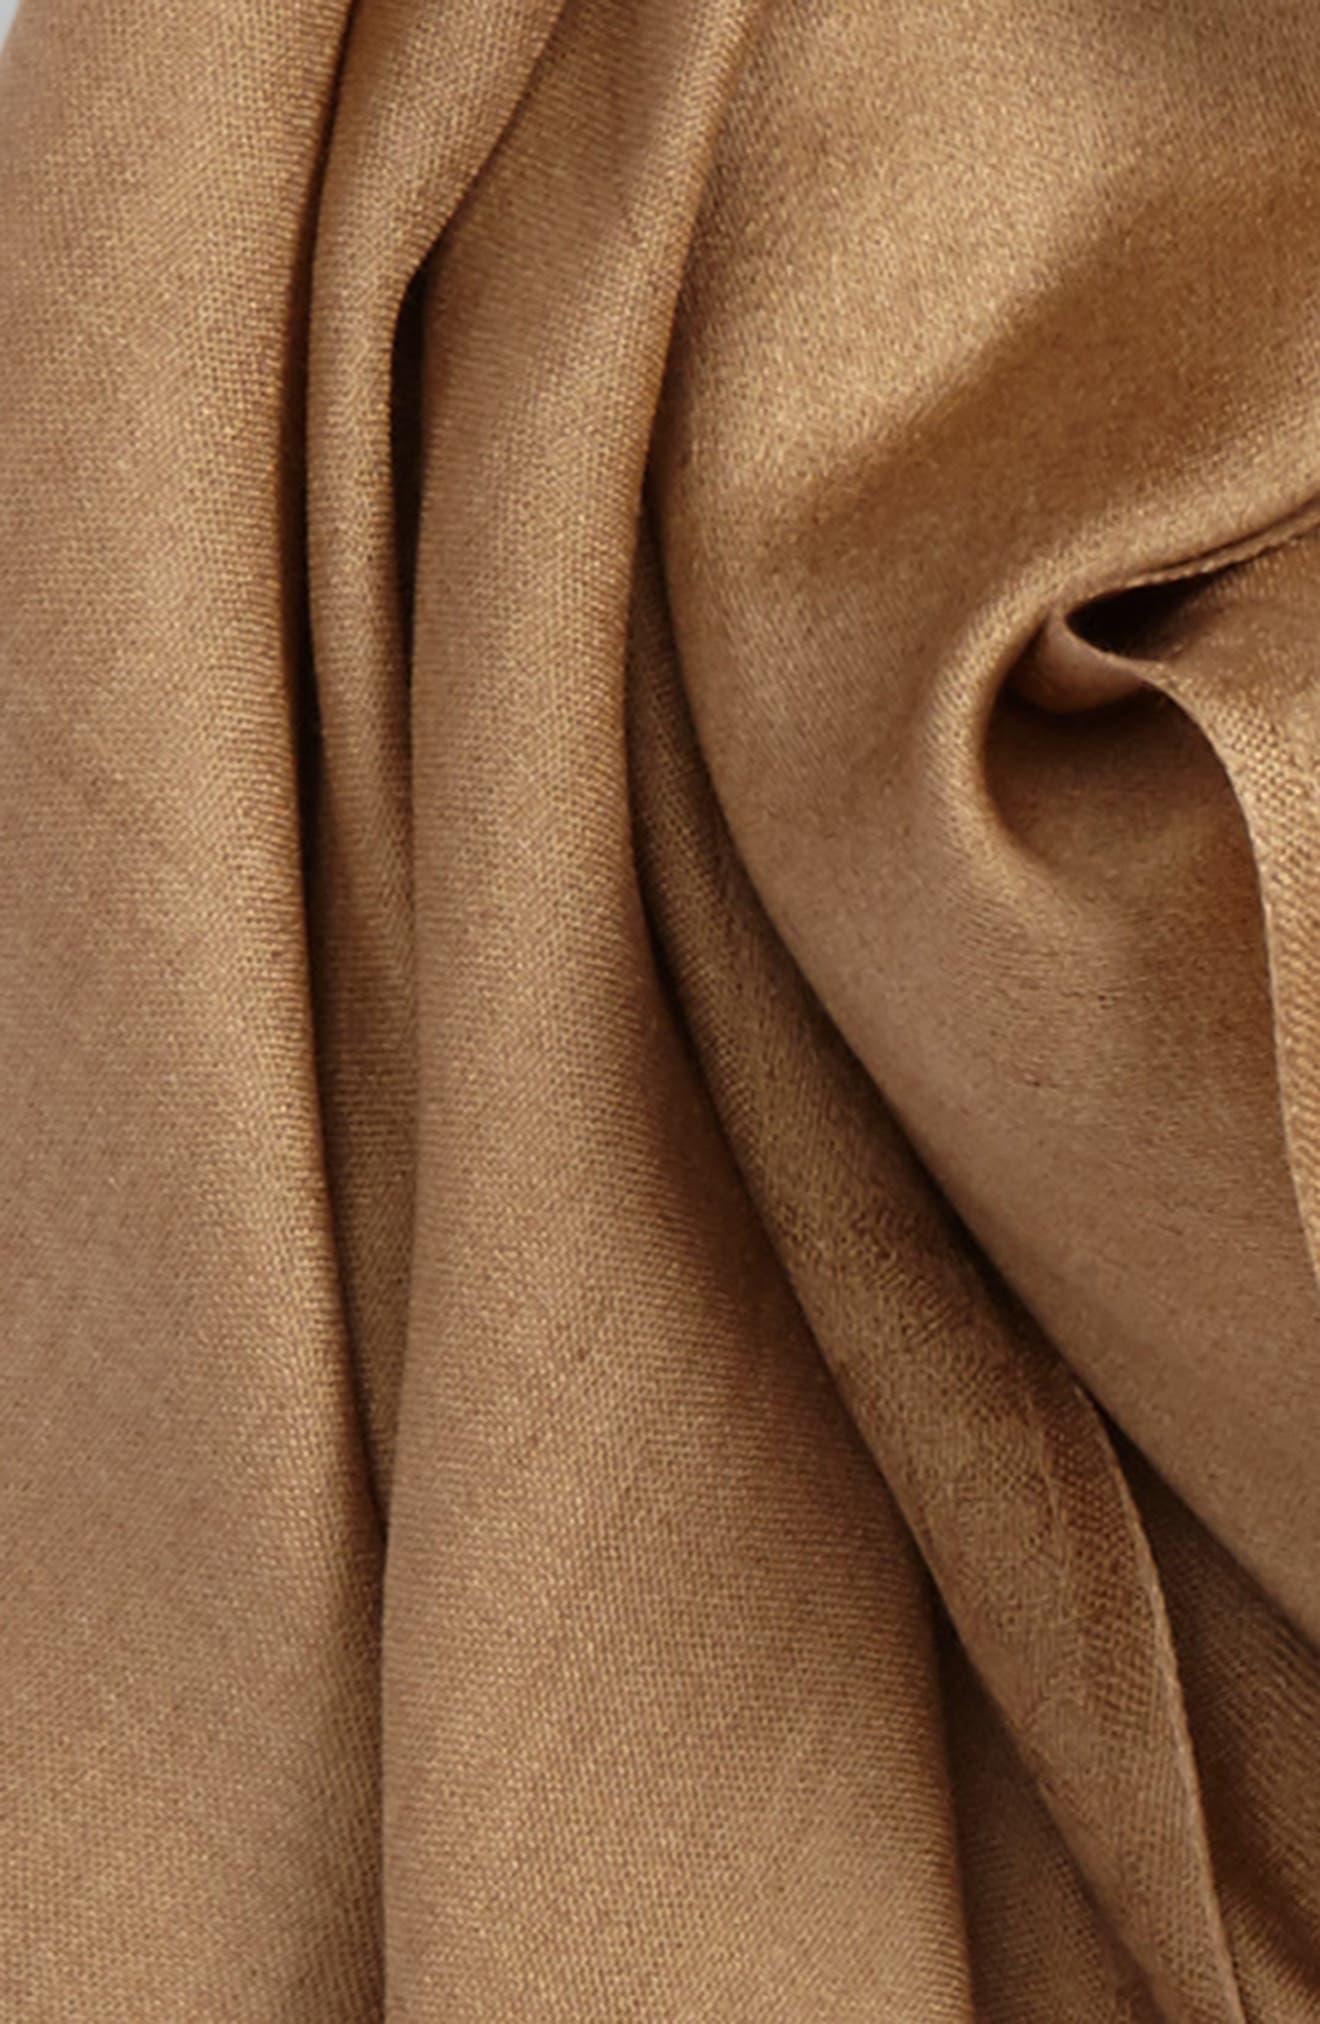 Upupa Silk Scarf,                             Alternate thumbnail 3, color,                             Camel